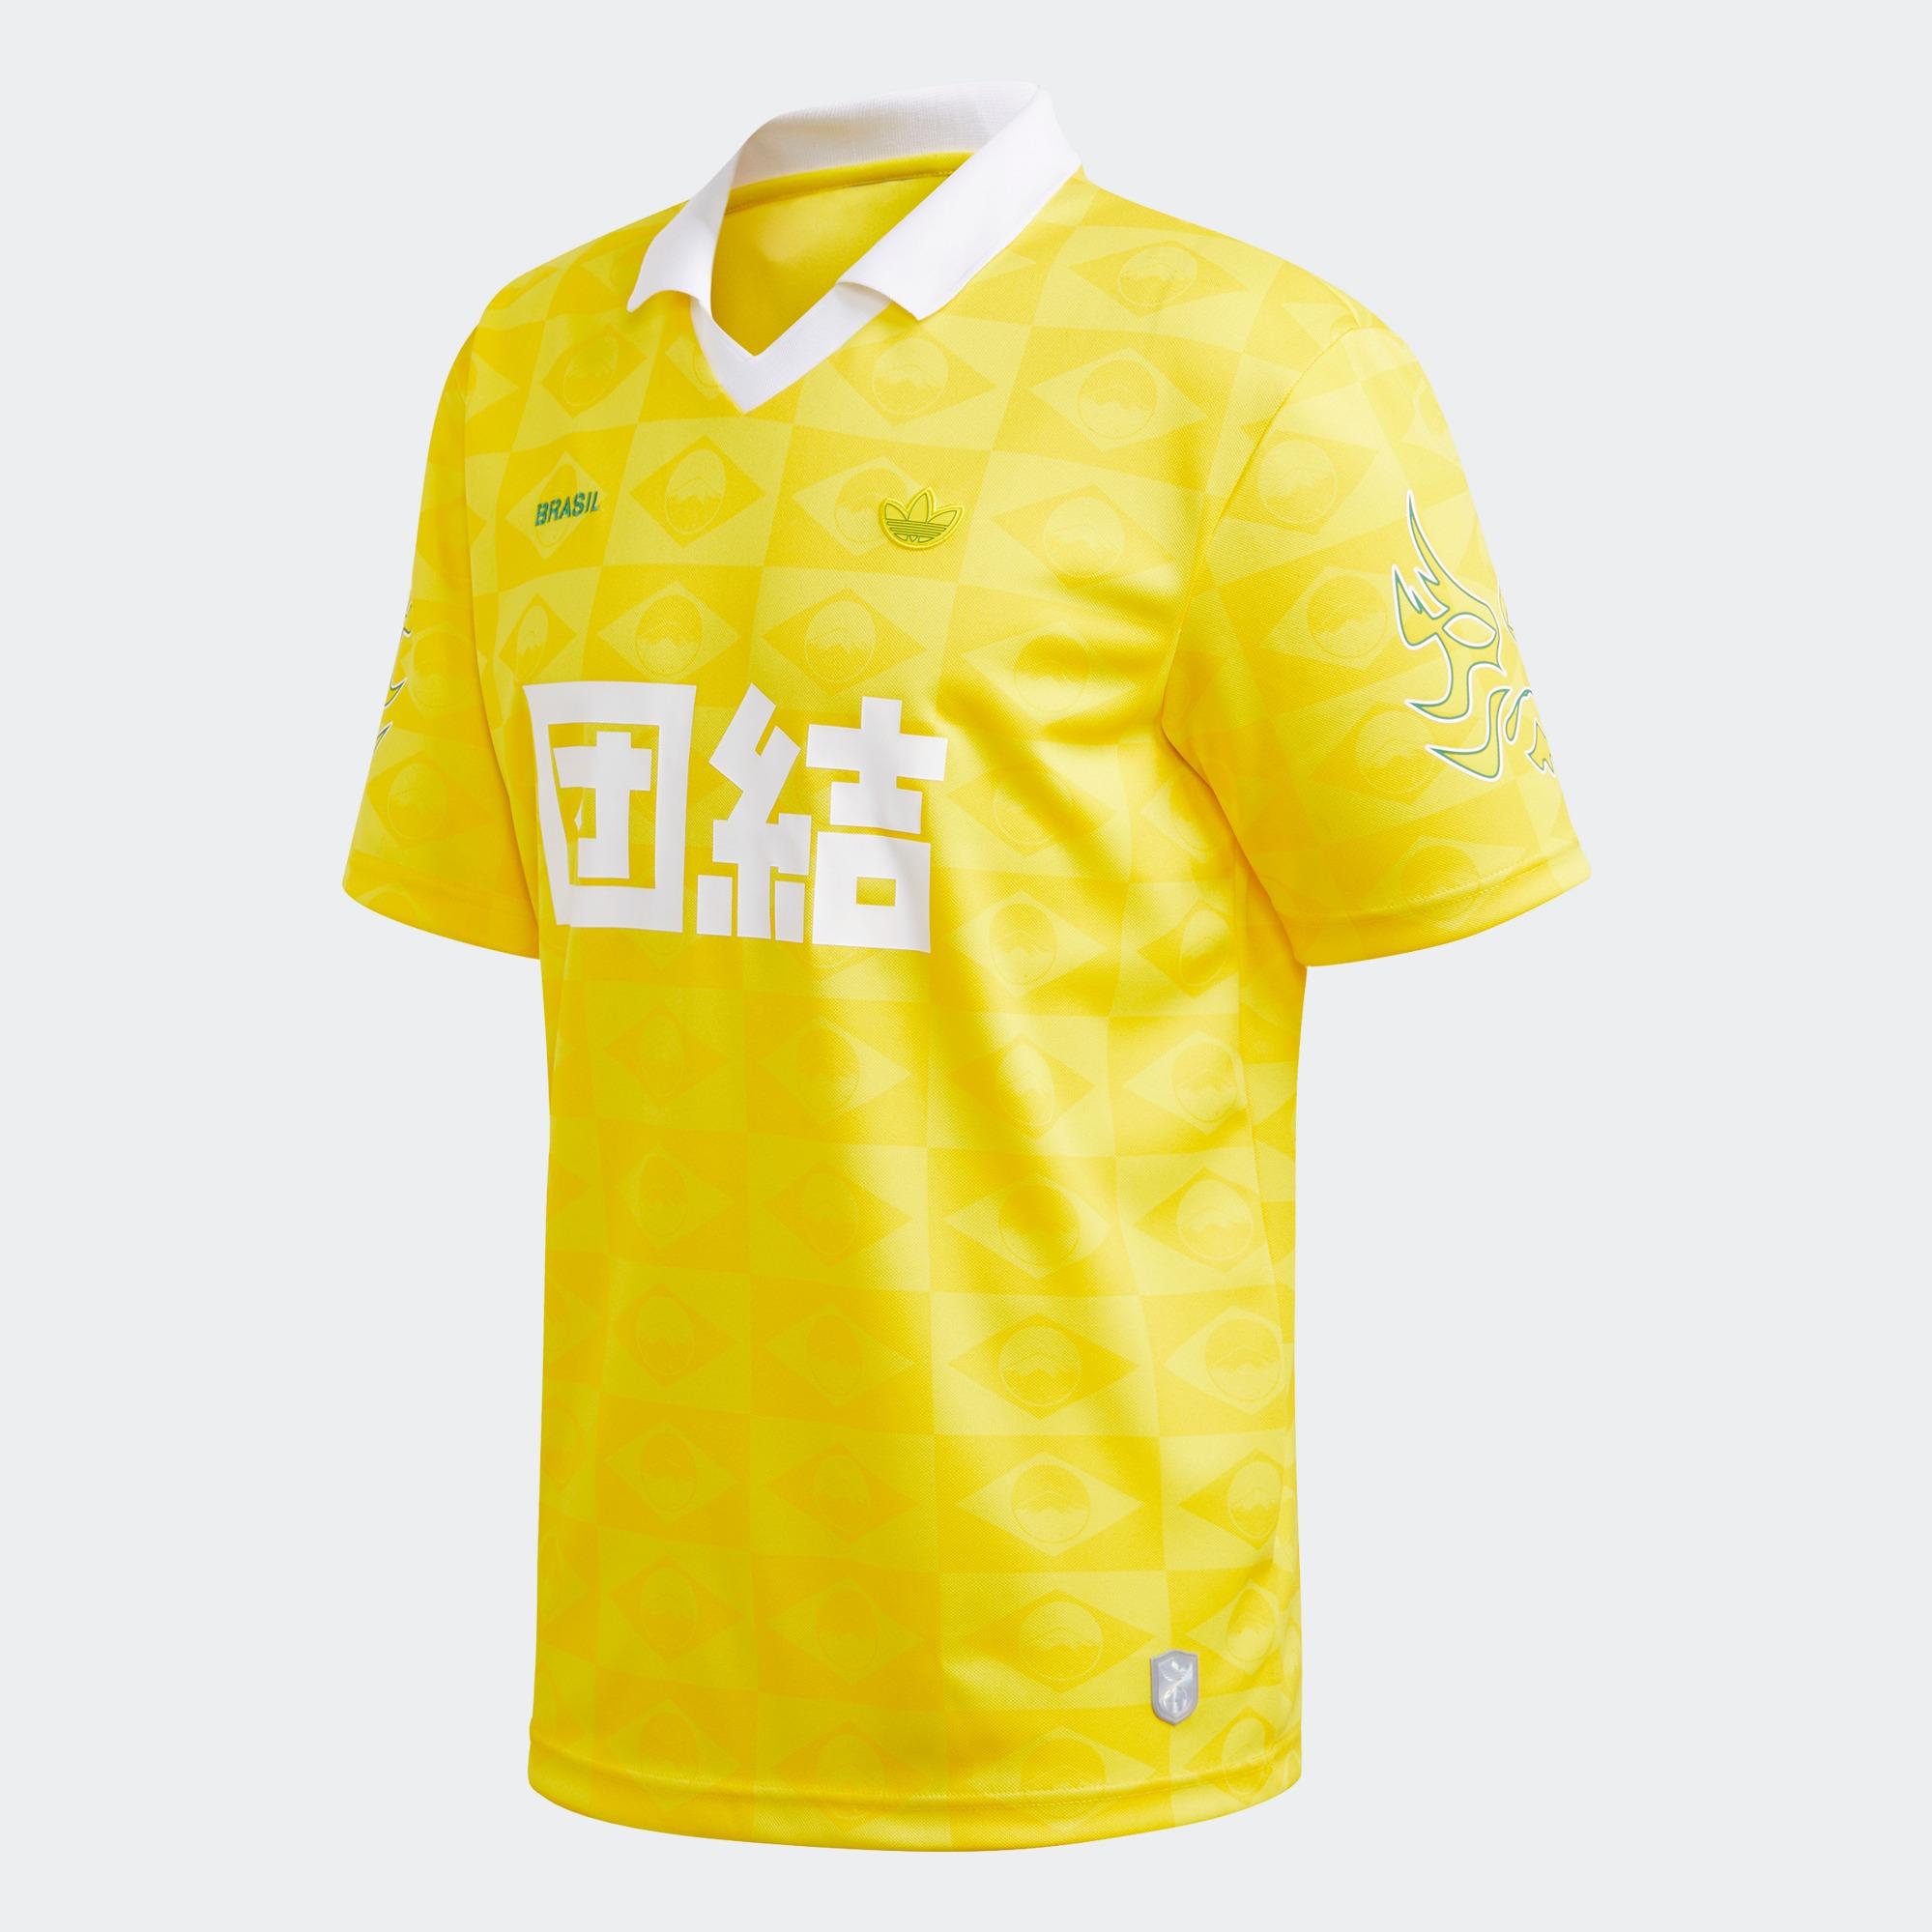 Sports Central Adidas Mens Brazil Jersey Originals, Yellow   Lazada PH